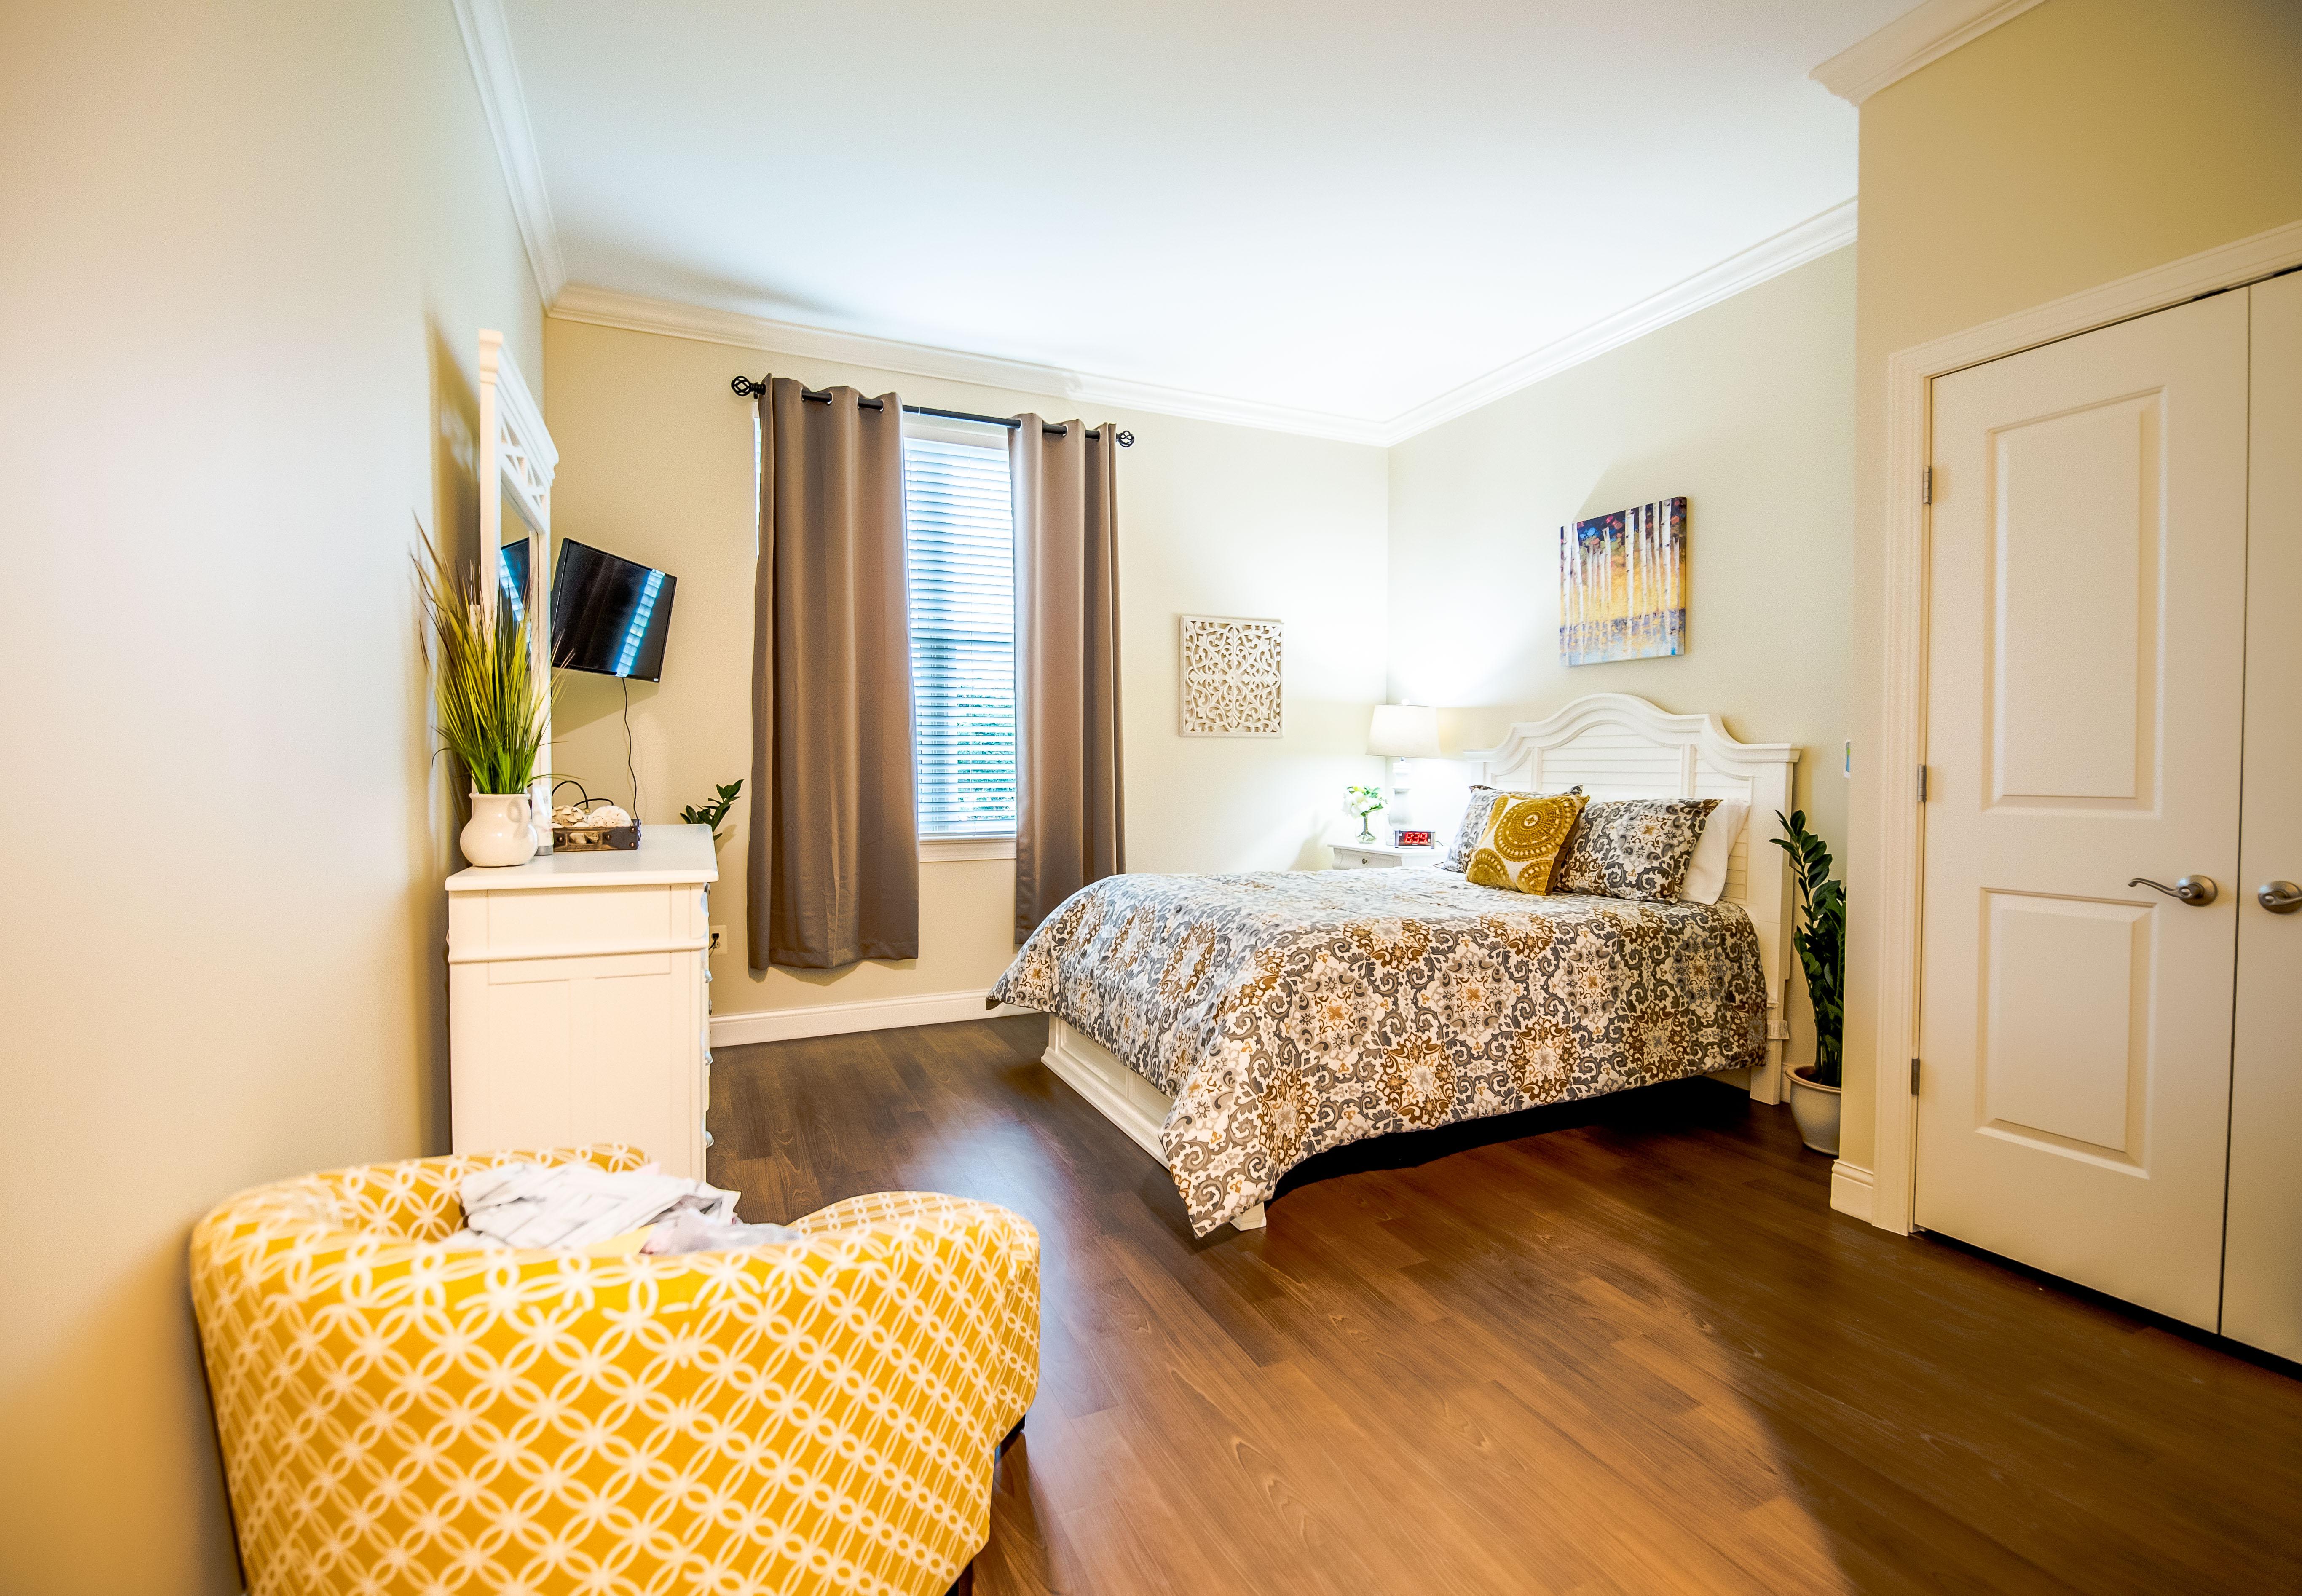 arbor-terrace-fairfax-bedroom-2